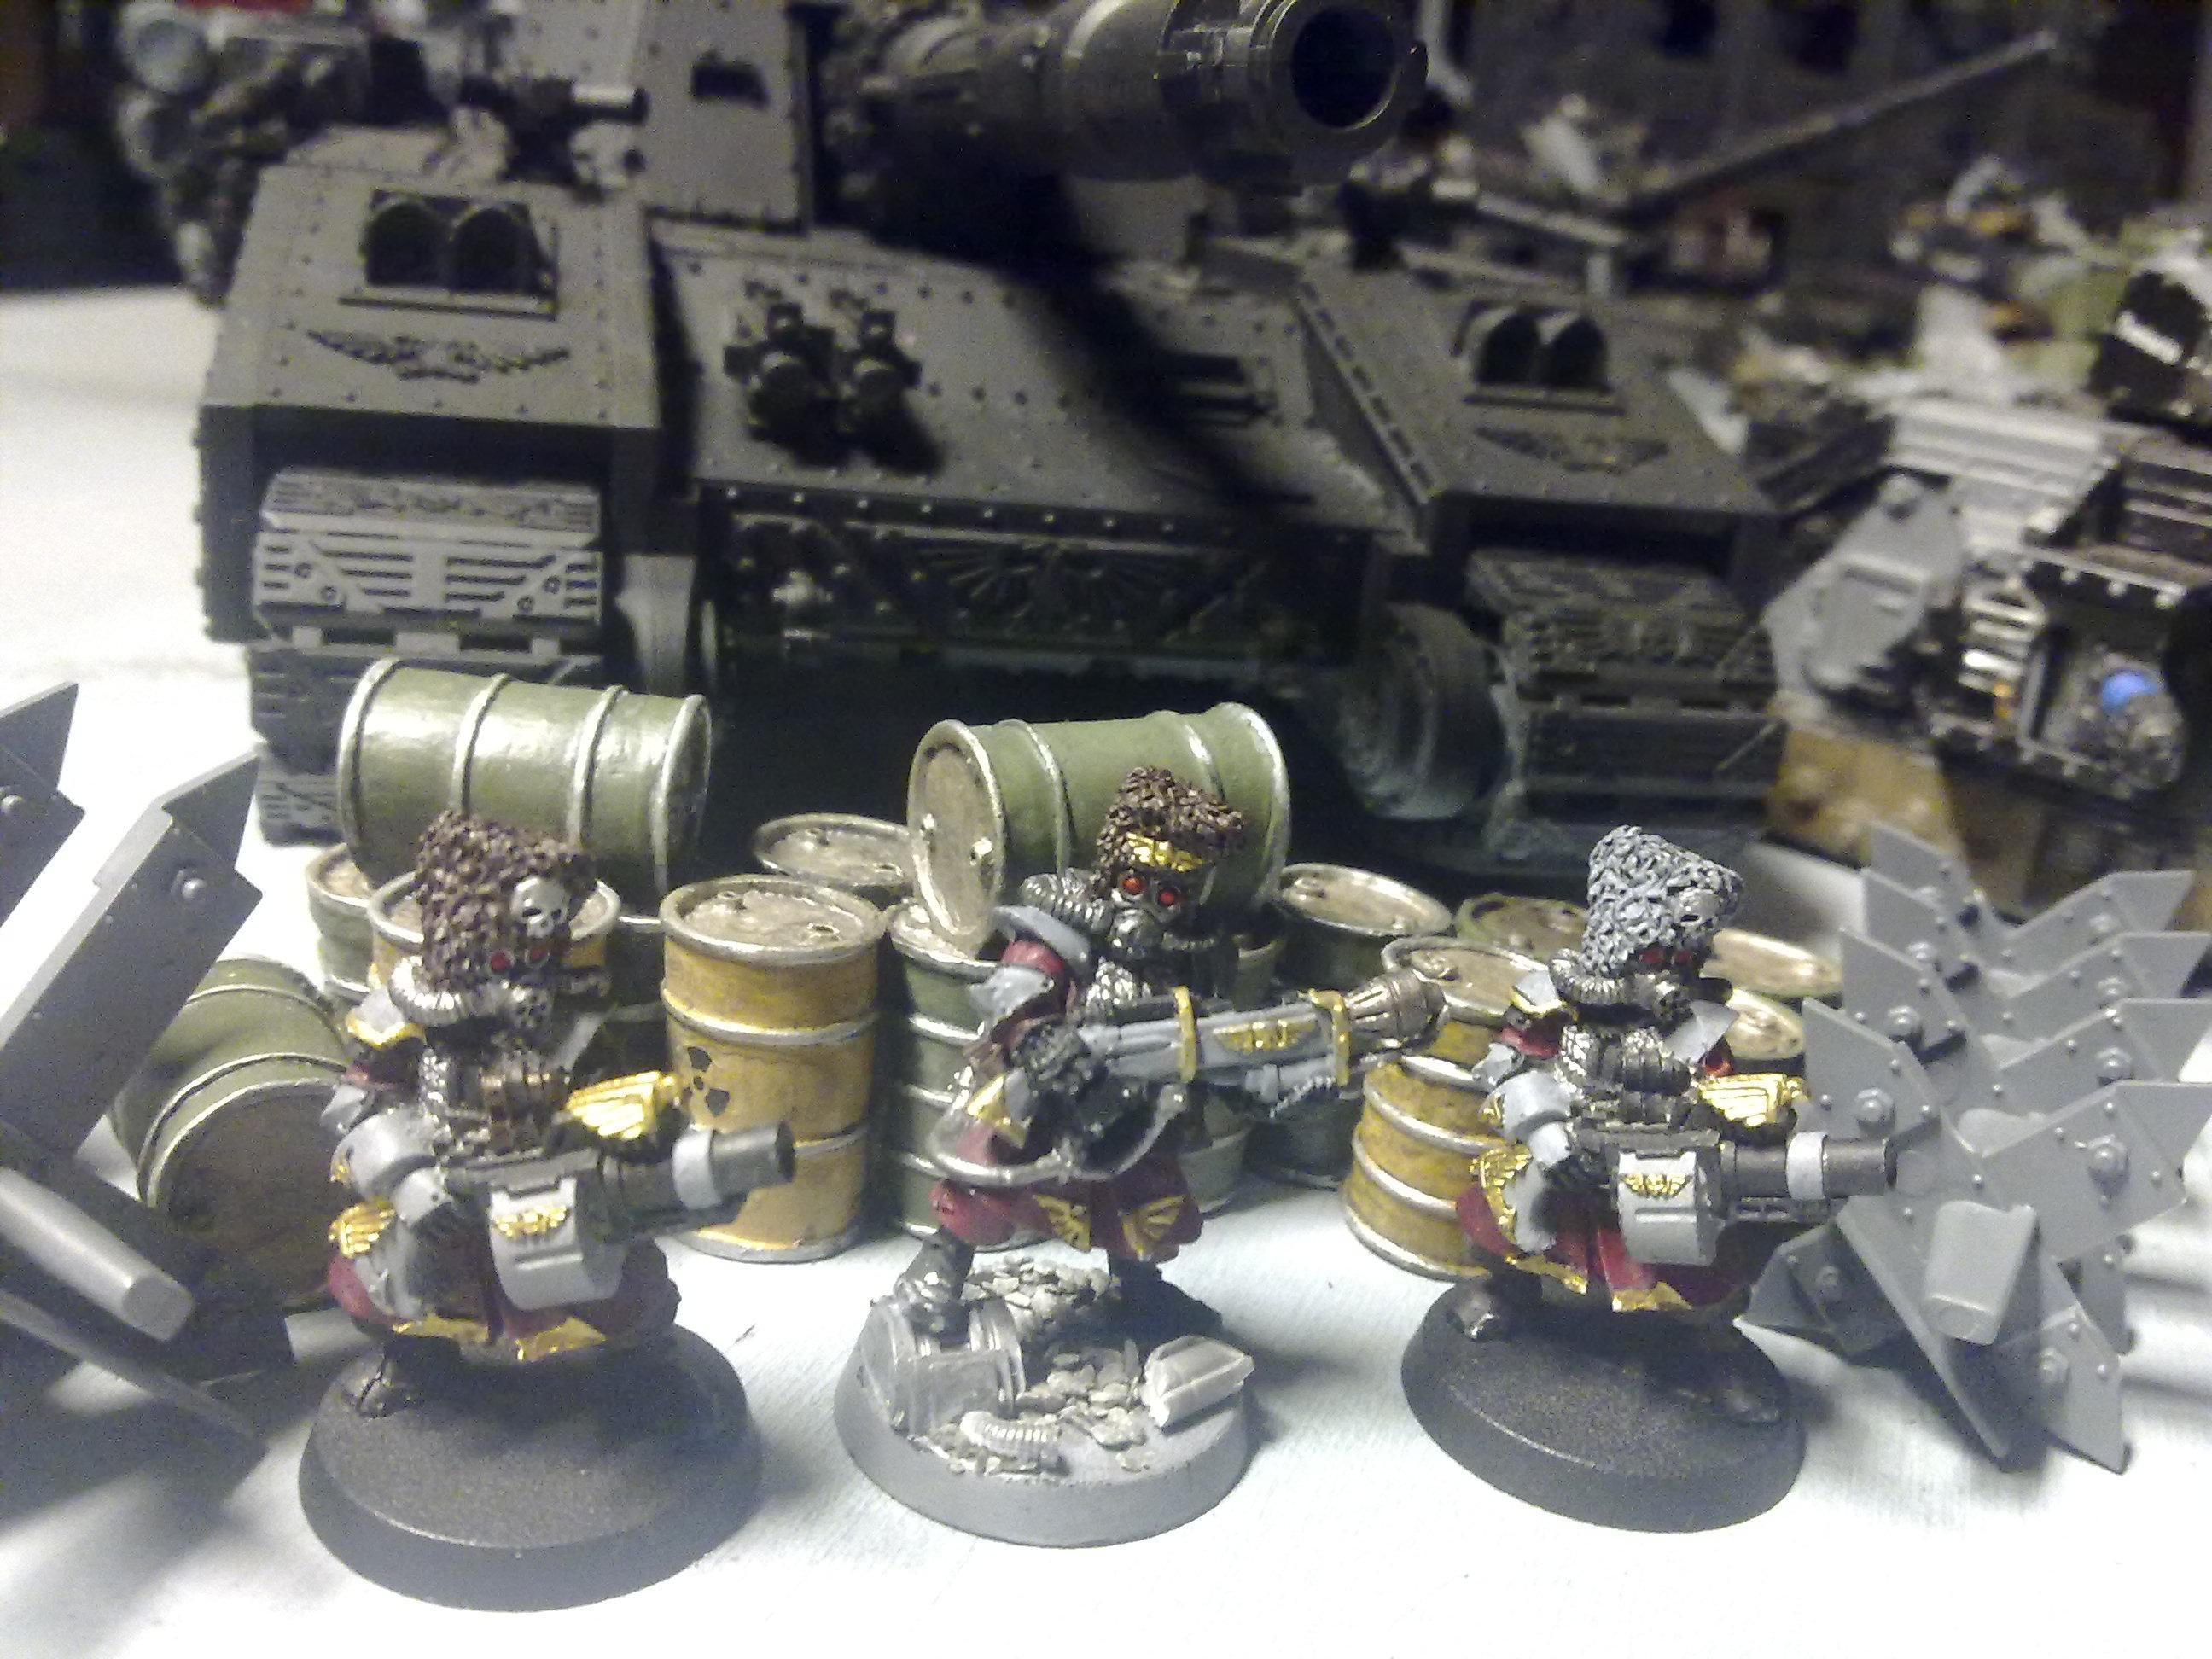 Work in progress Vostroyan special weapons